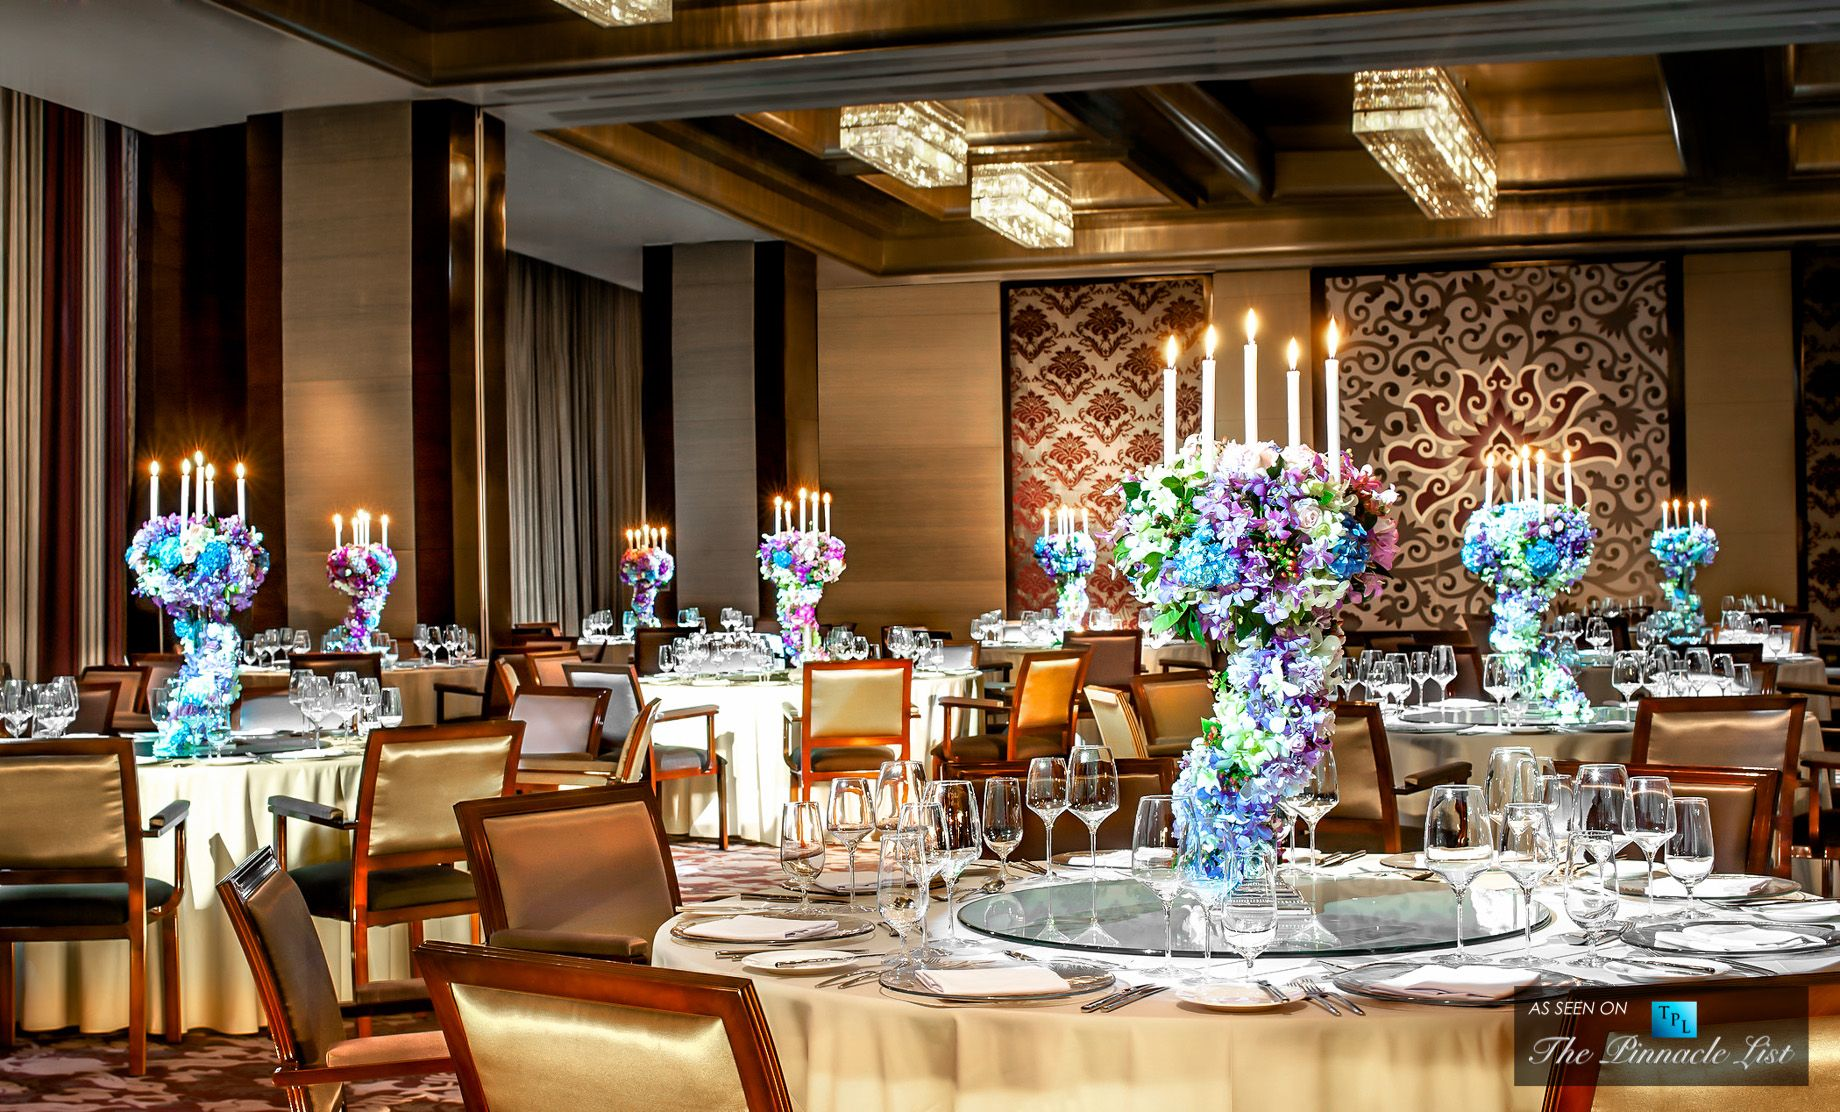 St regis luxury hotel bangkok thailand astor ballroom st regis luxury hotel bangkok thailand astor ballroom wedding setup junglespirit Gallery